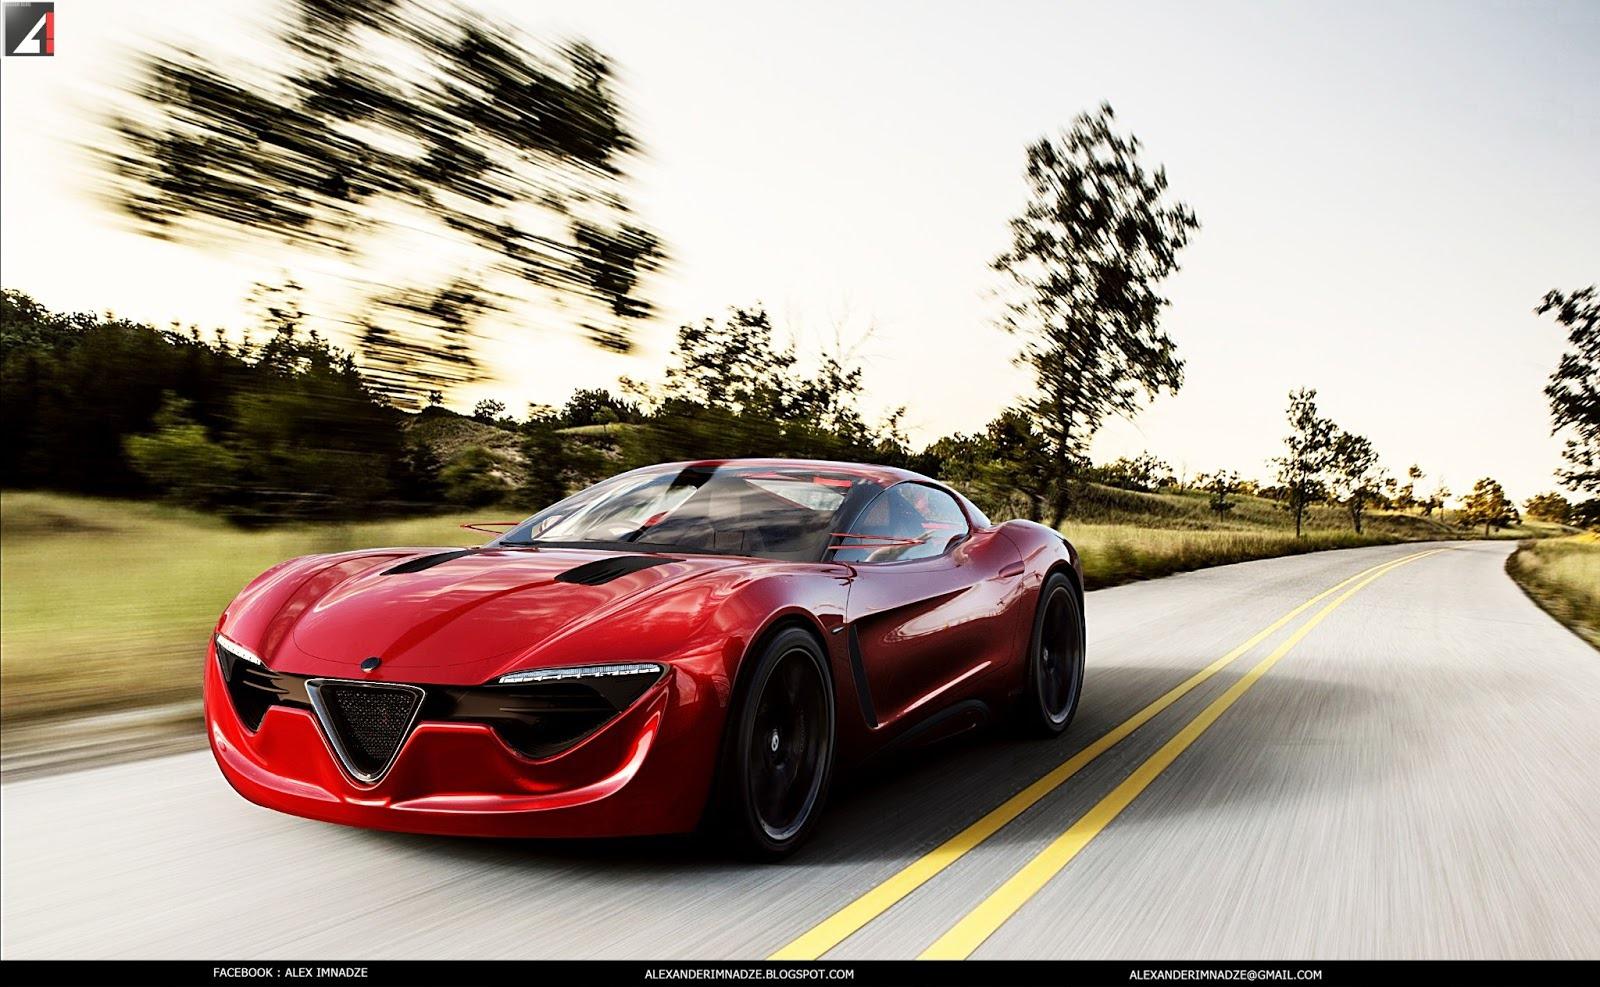 alfa romeo 6c concept the italian musclecar autoevolution. Black Bedroom Furniture Sets. Home Design Ideas